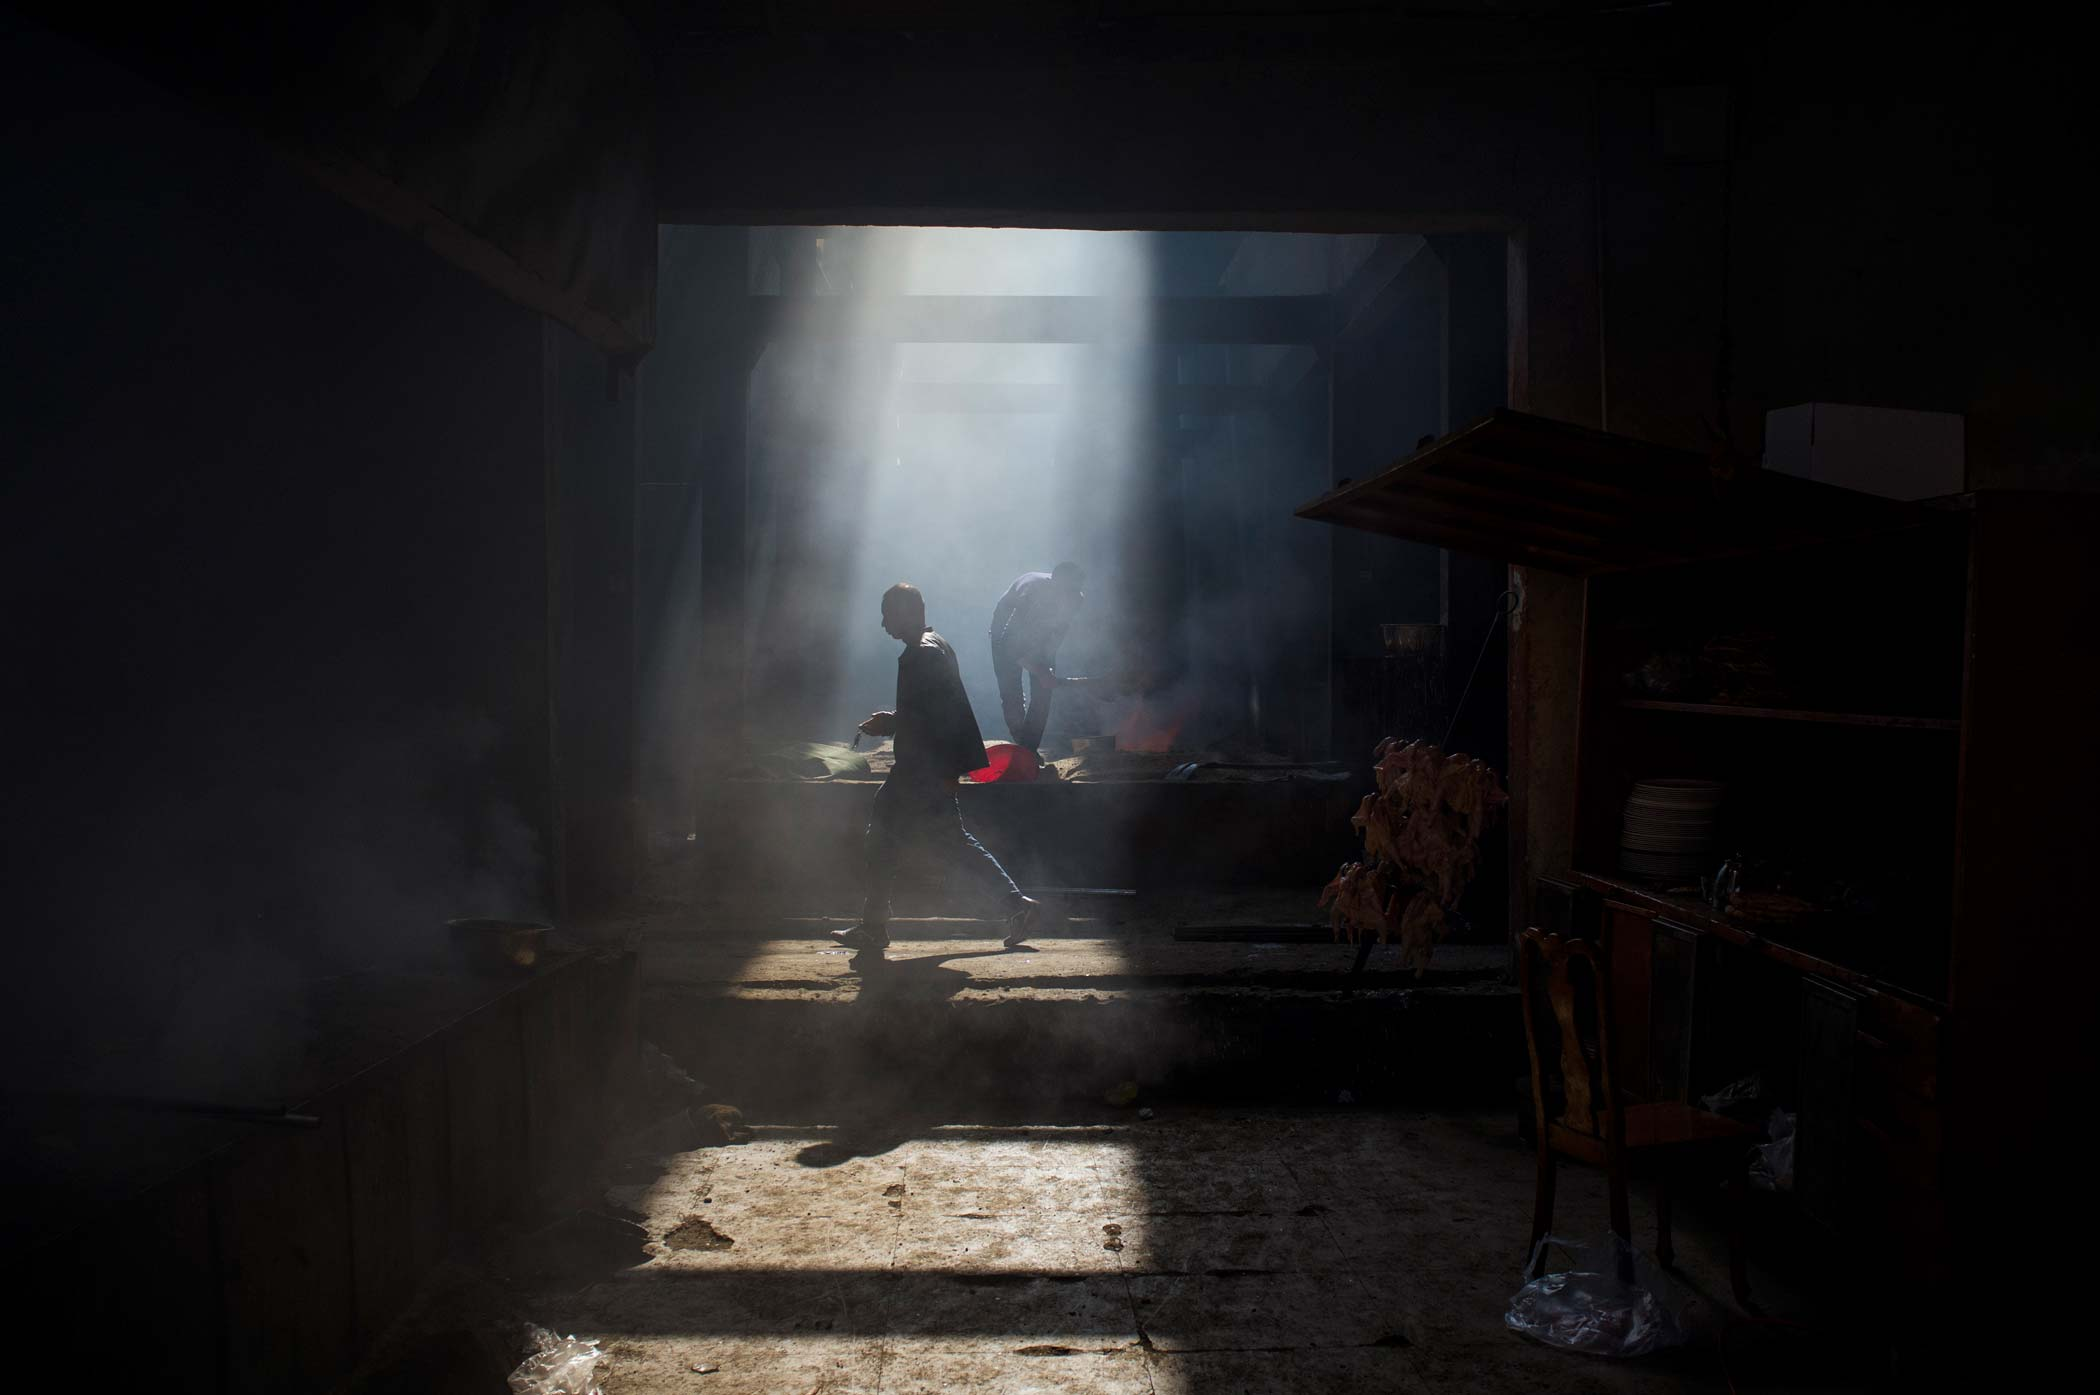 A man walks across a shaft of light in a kitchen in Hotan.